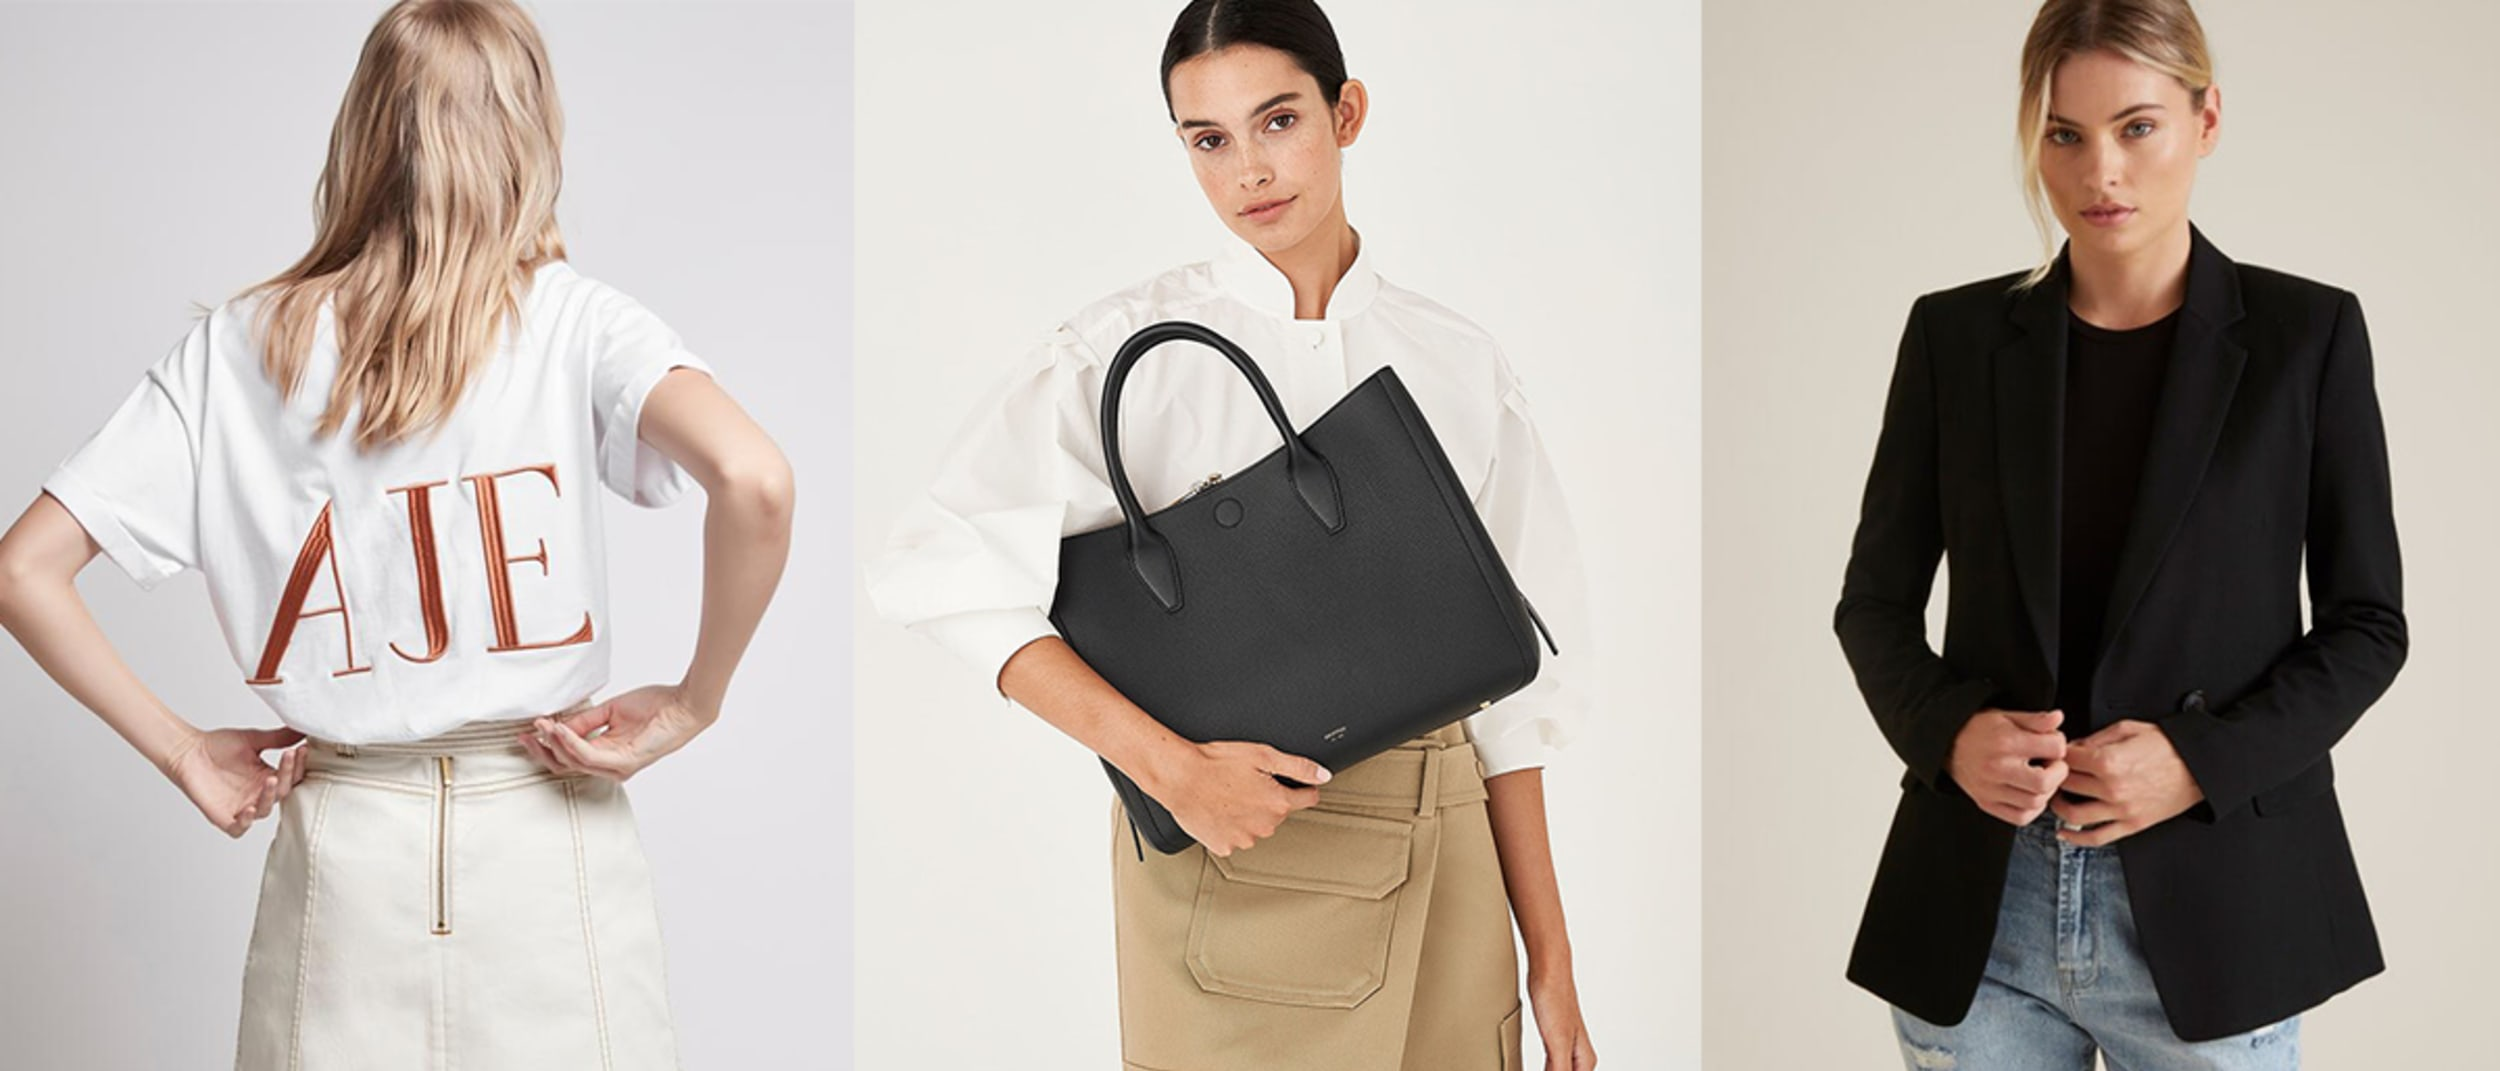 11 wardrobe essentials you should own in 2020